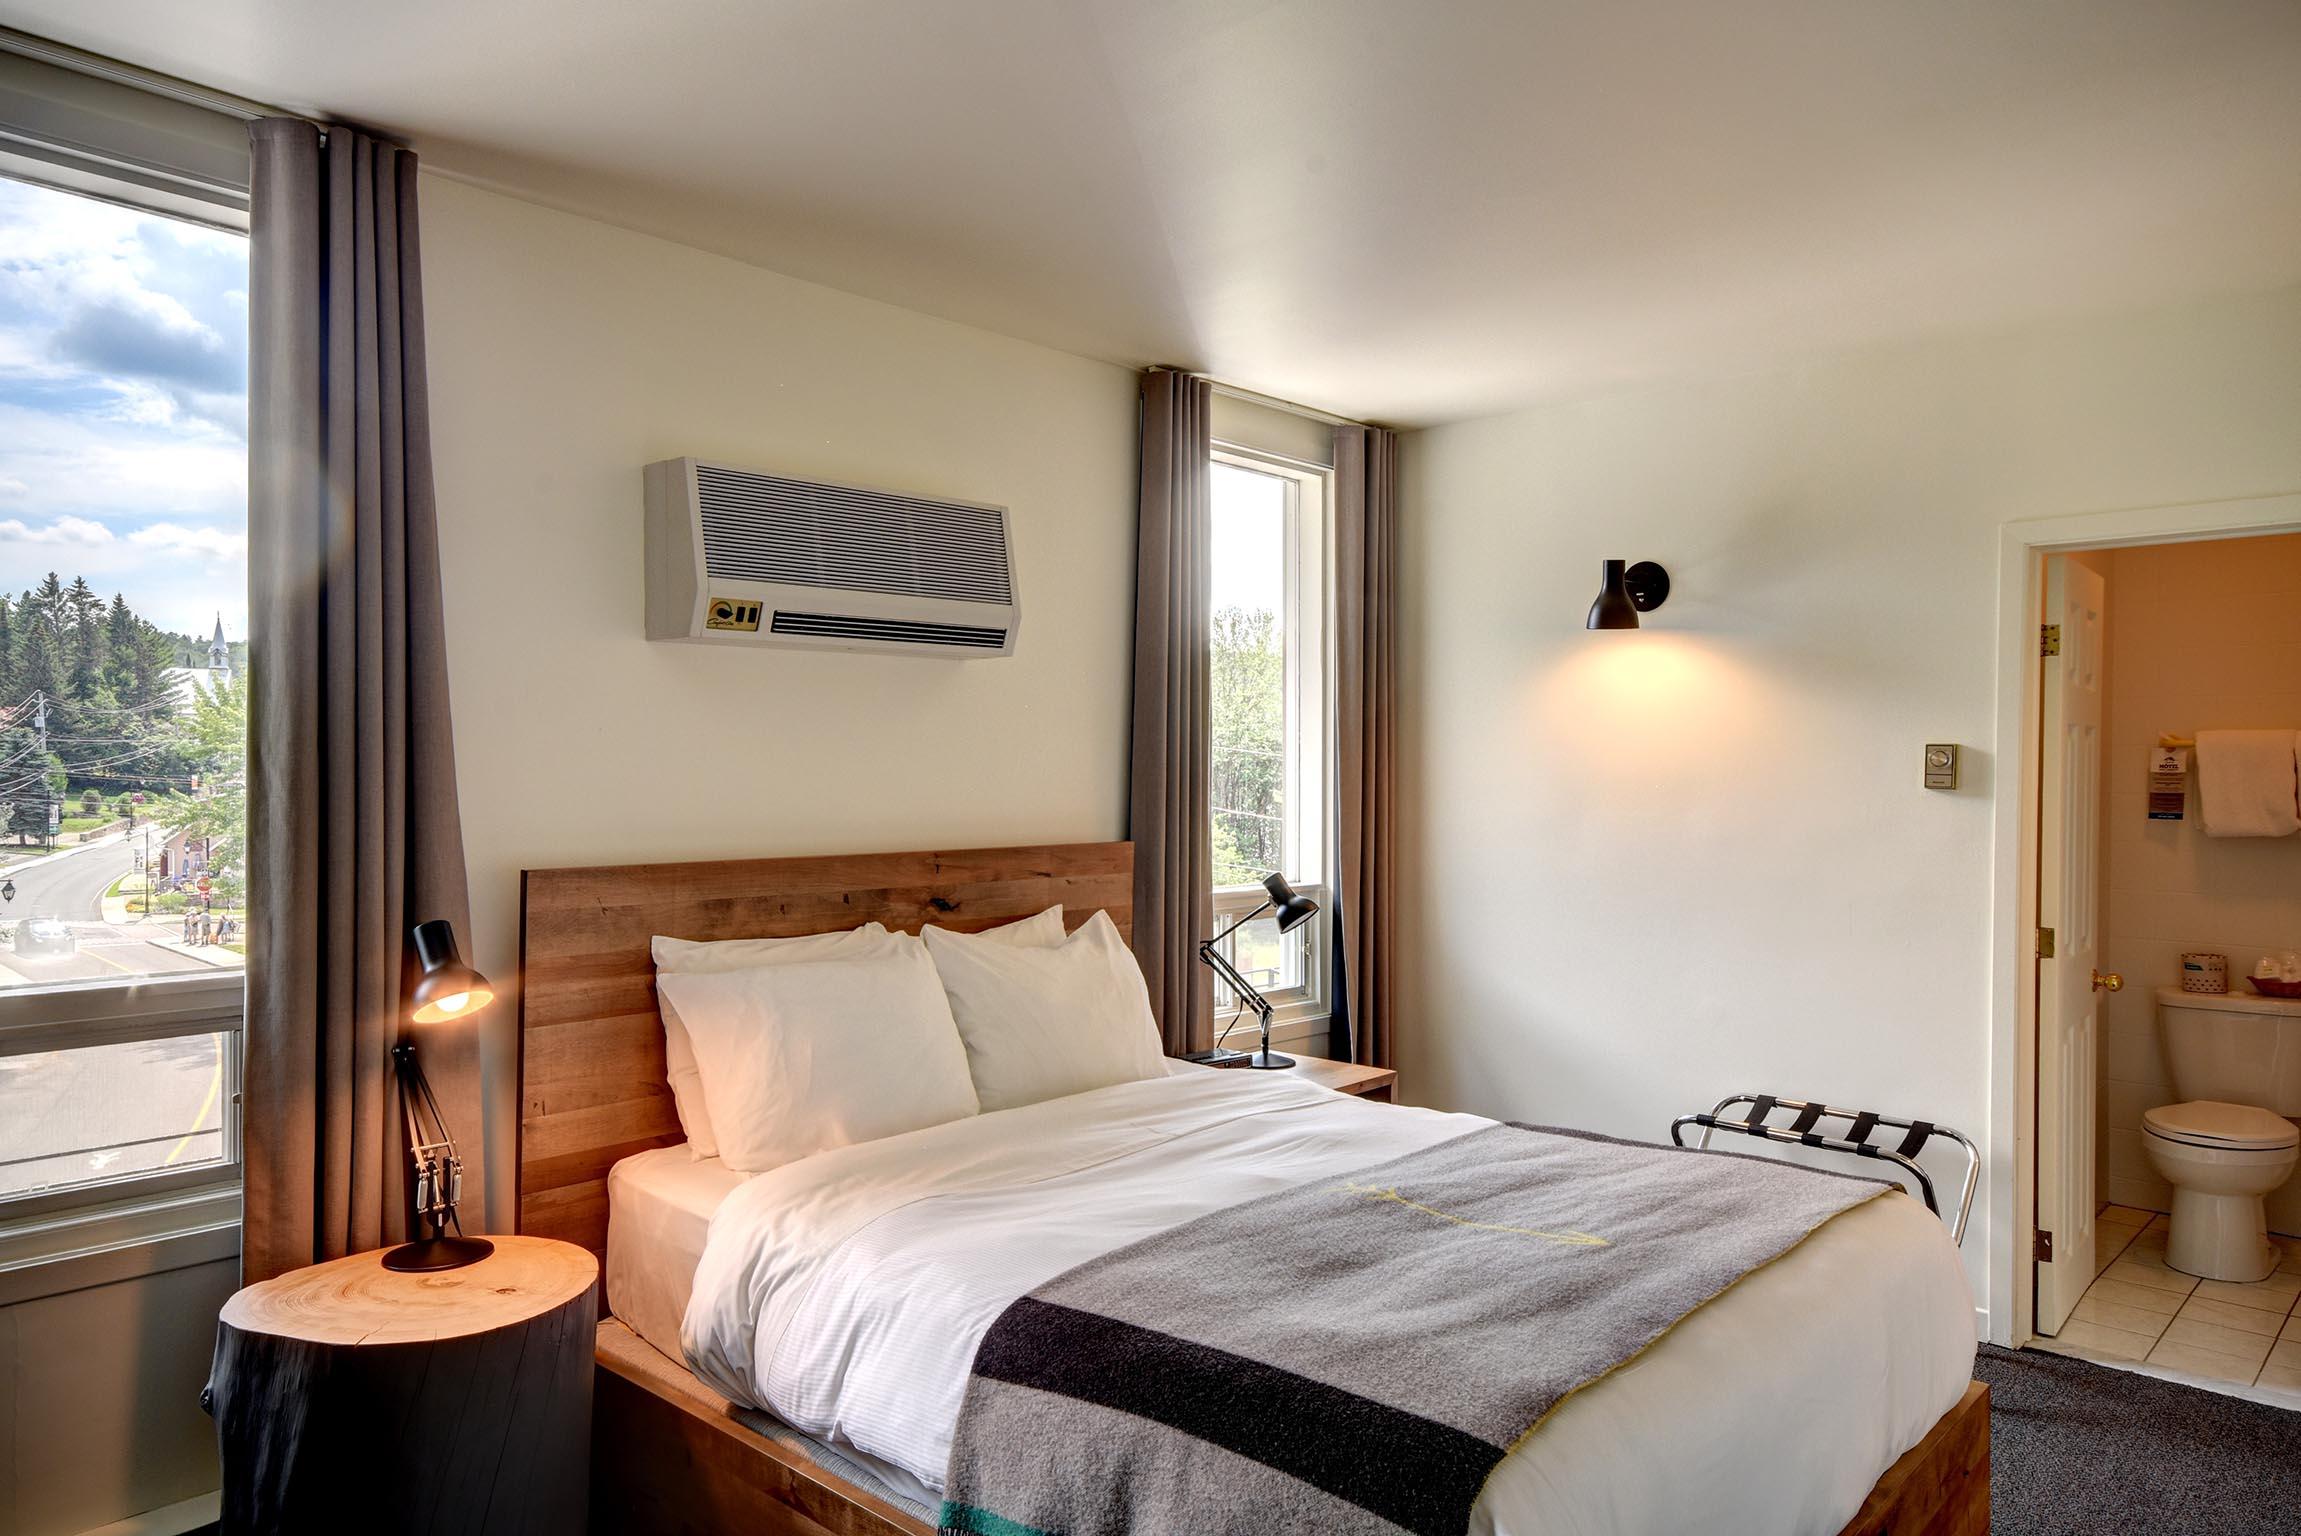 Un hôtel historique à Tremblant - quebec, laurentides, hotels, destinations, canada, amerique-du-nord